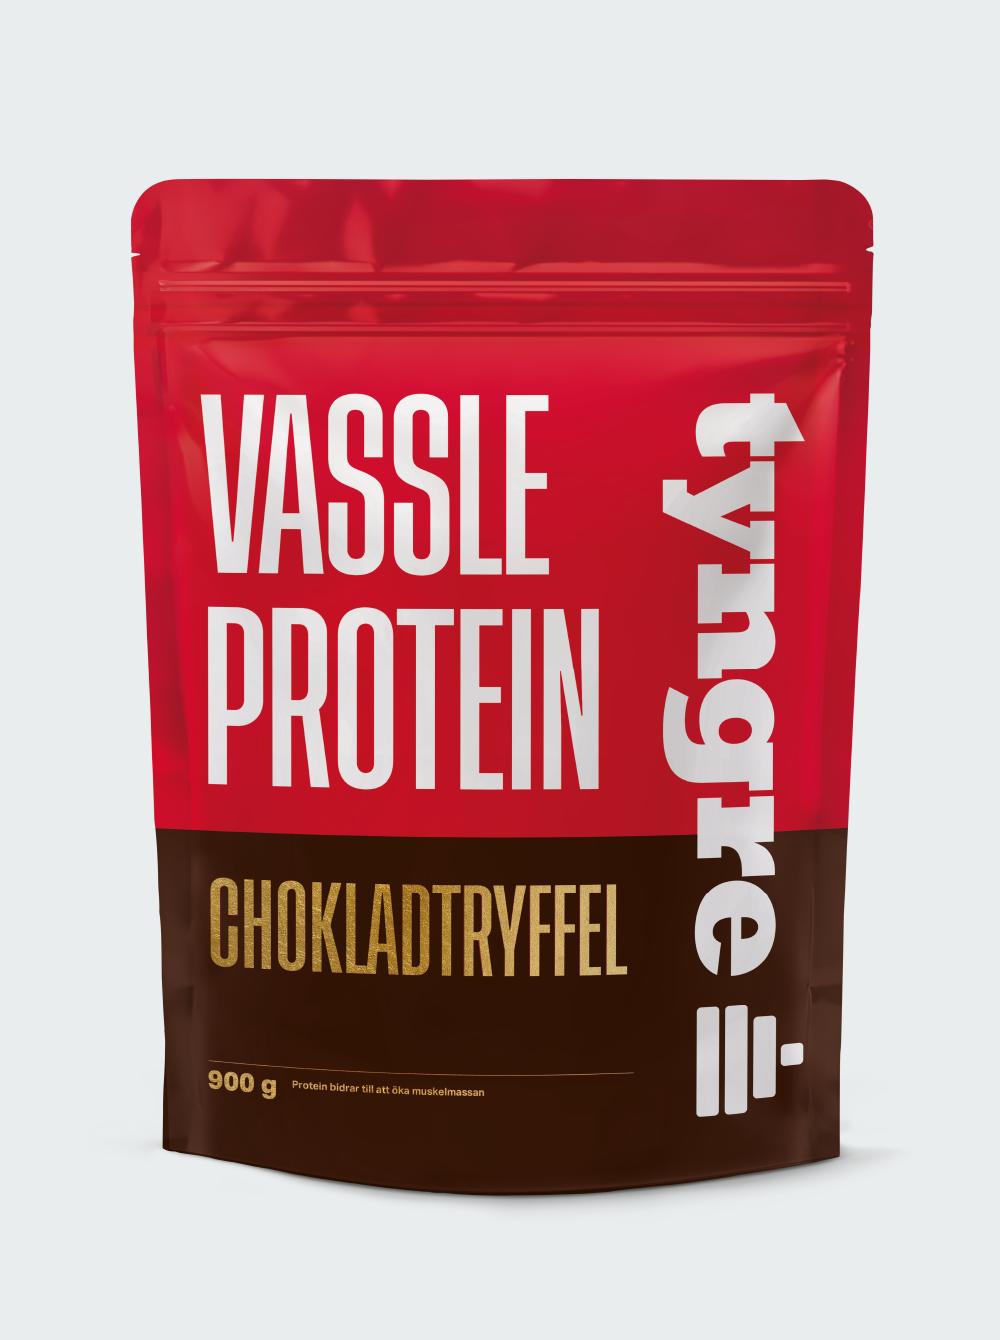 Vassle Chokladtryffel